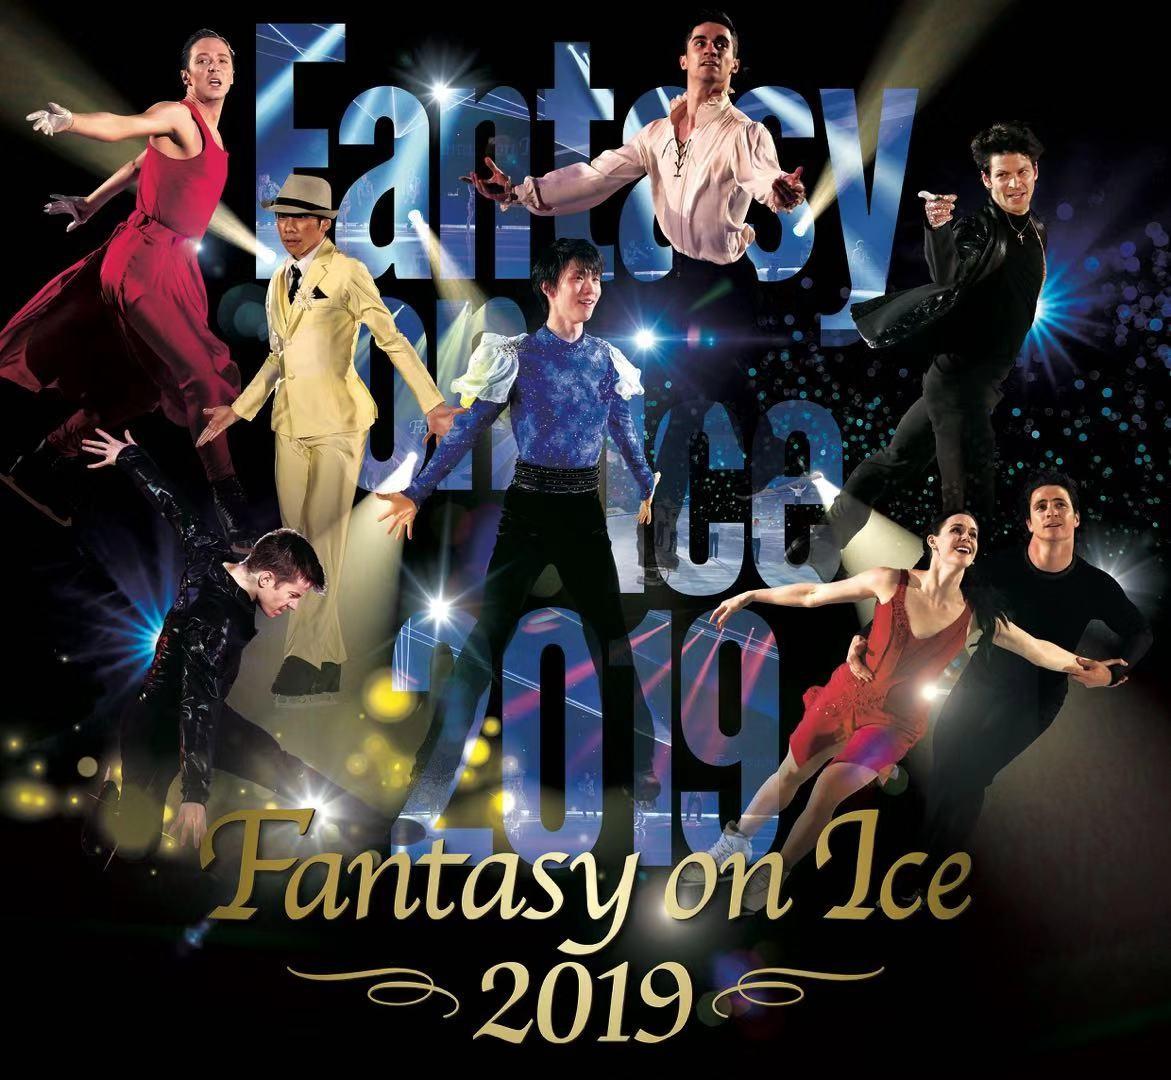 Fantasy on Ice2020冰上幻想发布会登陆上海 梦幻冰上艺术大秀上演